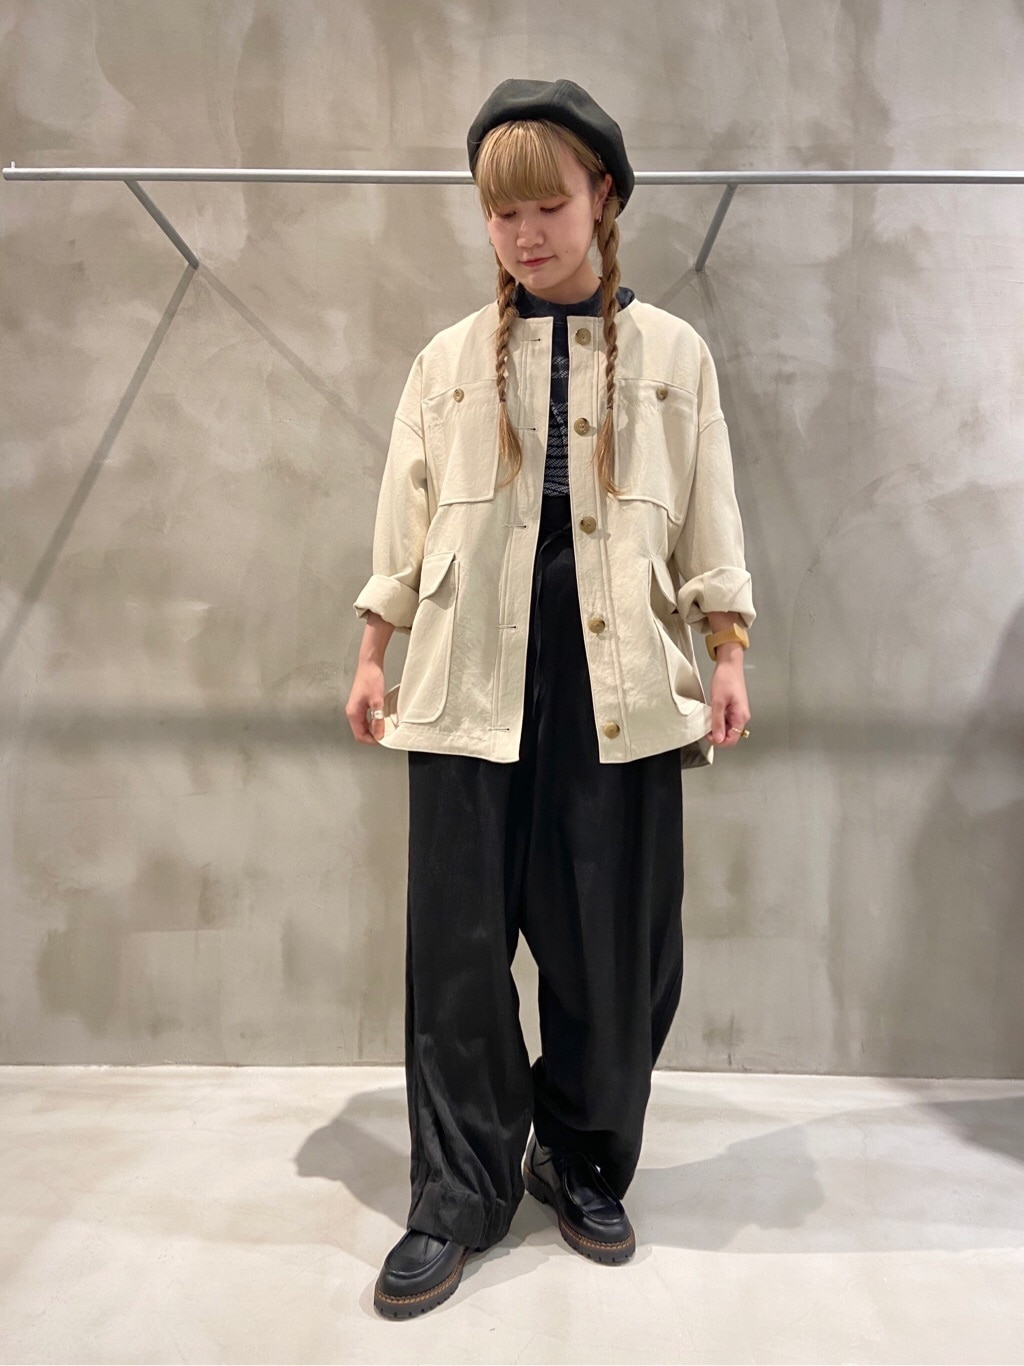 bulle de savon 渋谷スクランブルスクエア 身長:160cm 2020.09.10